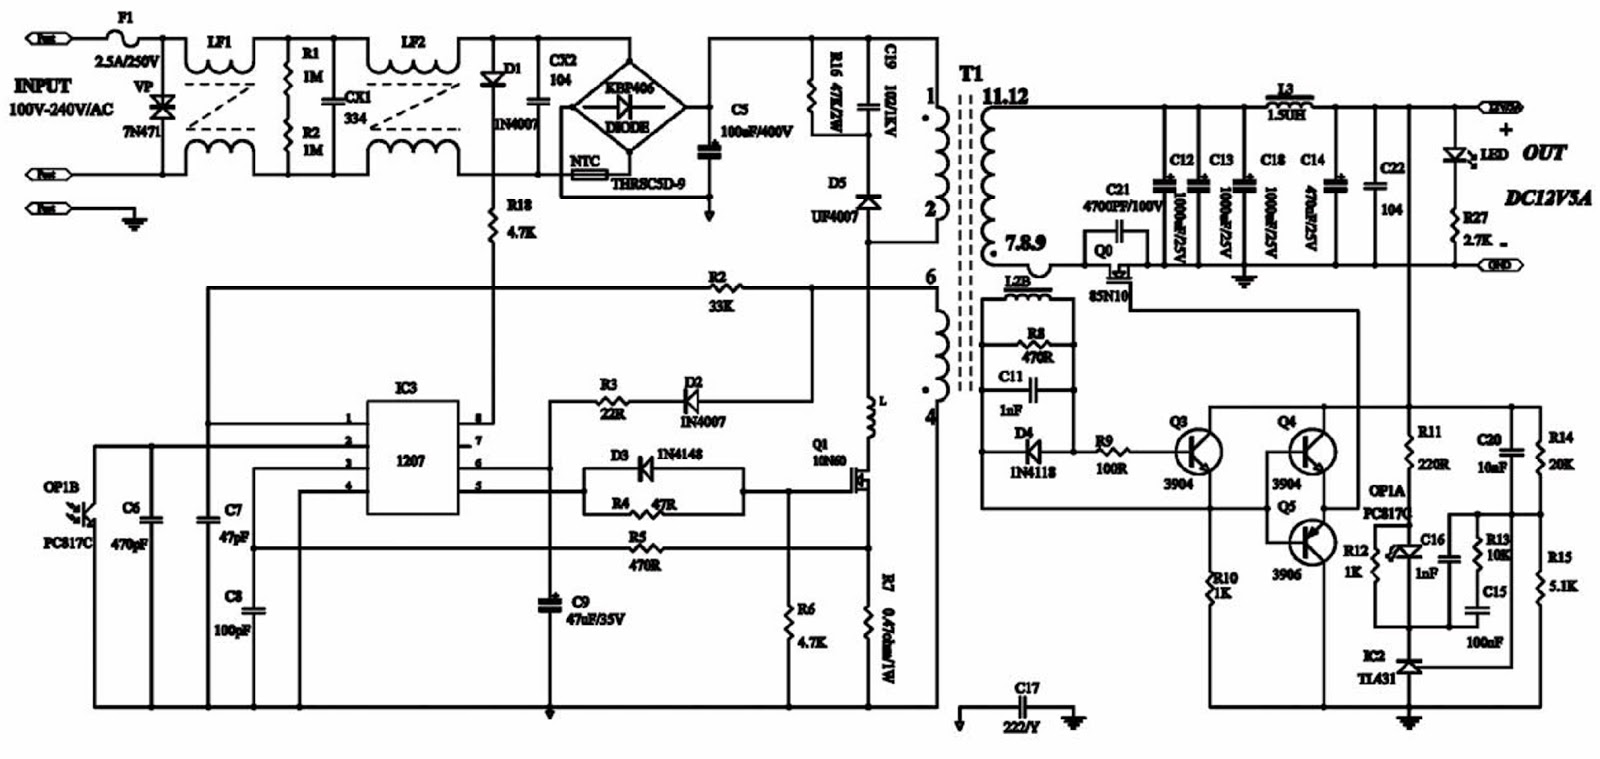 medium resolution of tv schematic circuit diagram wiring diagram load samsung lcd tv schematic diagram